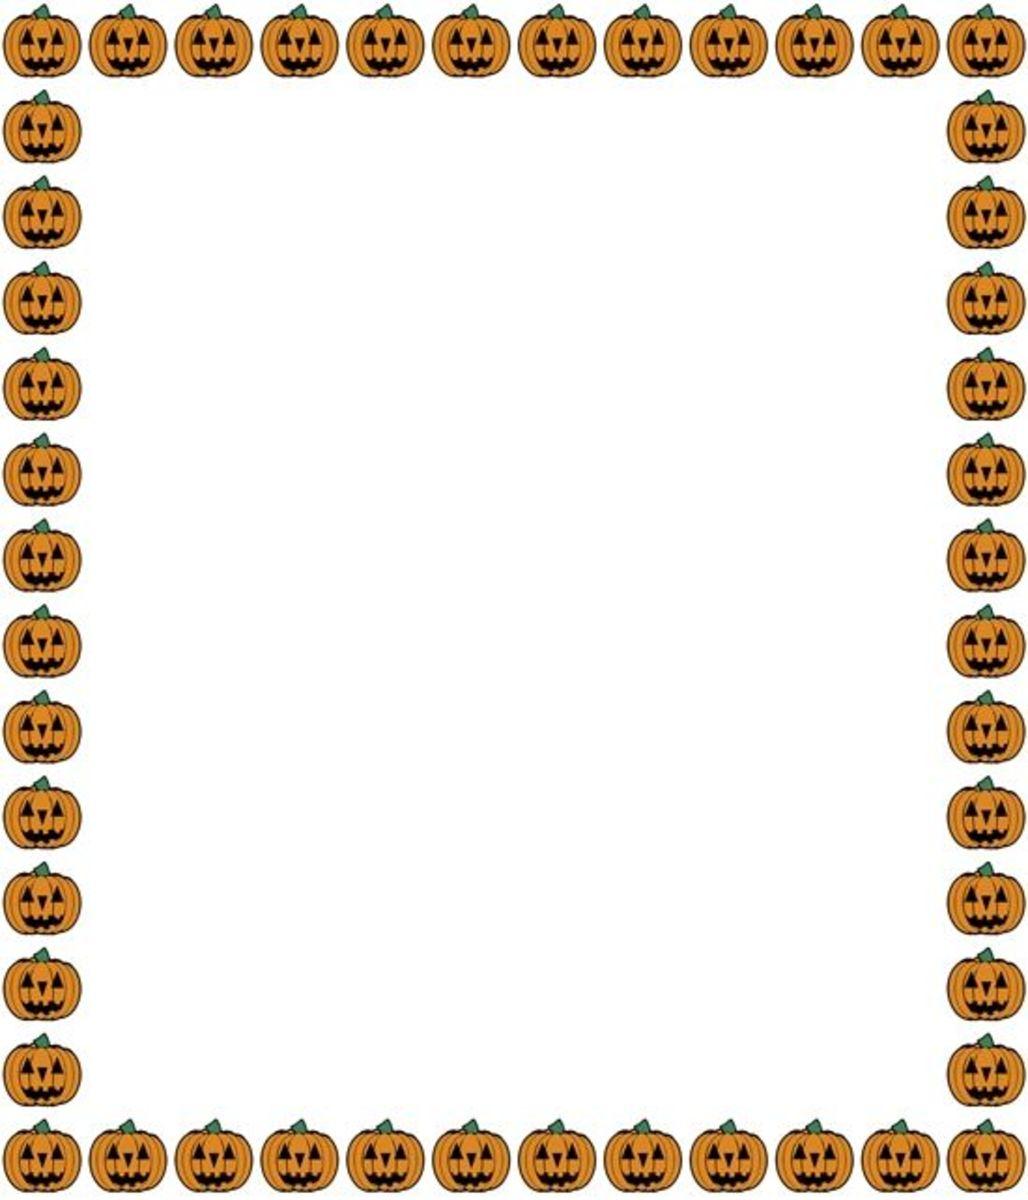 Jack-o-Lanterns Halloween clip art frame.